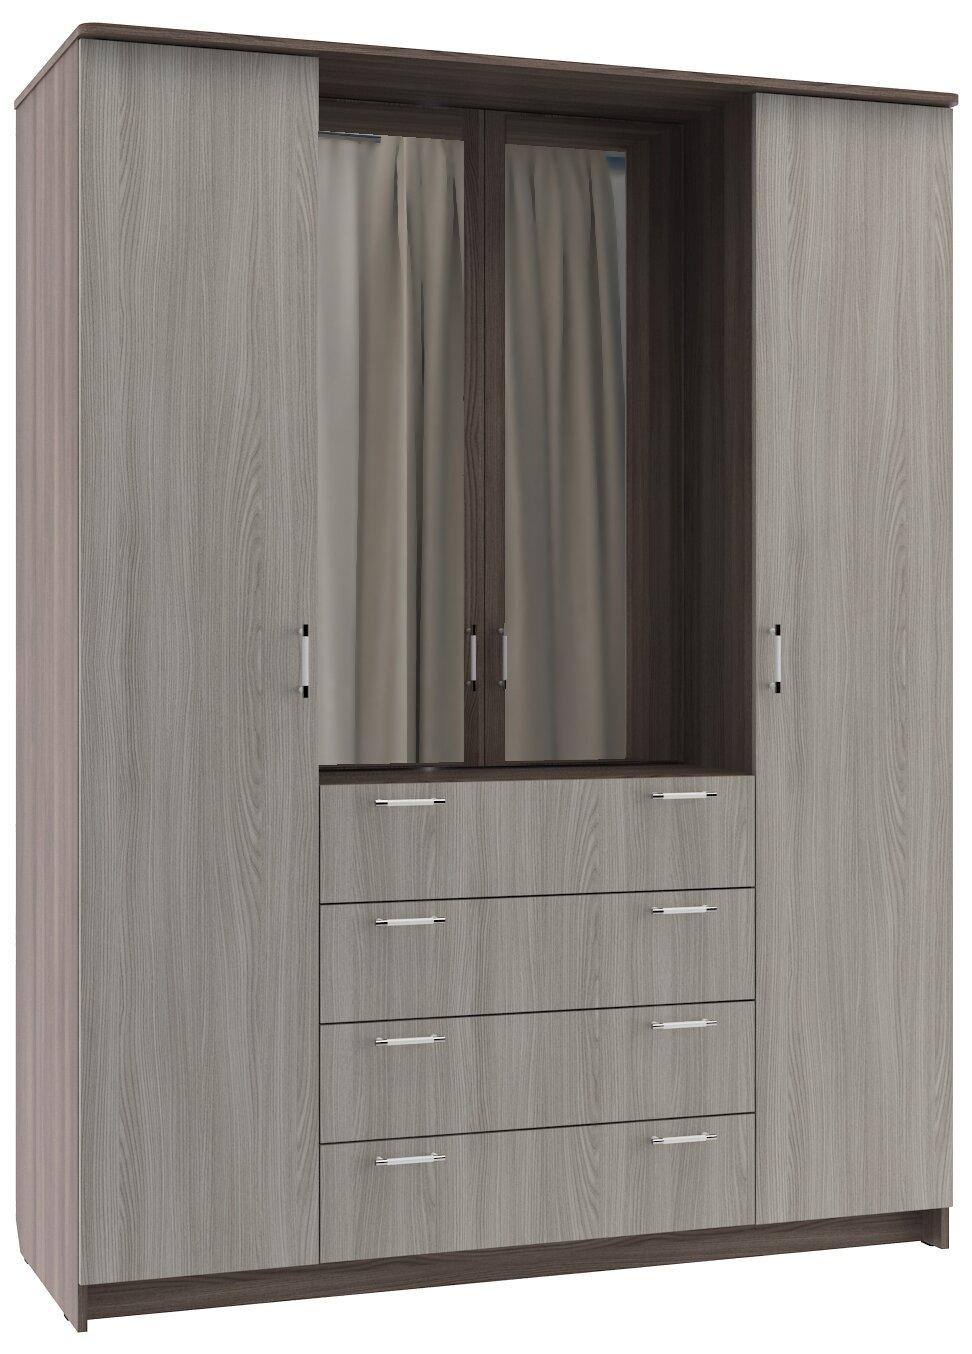 Шкаф шкаф-комод 4-х створчатый без зеркалаШкафы<br><br><br>Длина мм: 1600<br>Высота мм: 2100<br>Глубина мм: 650